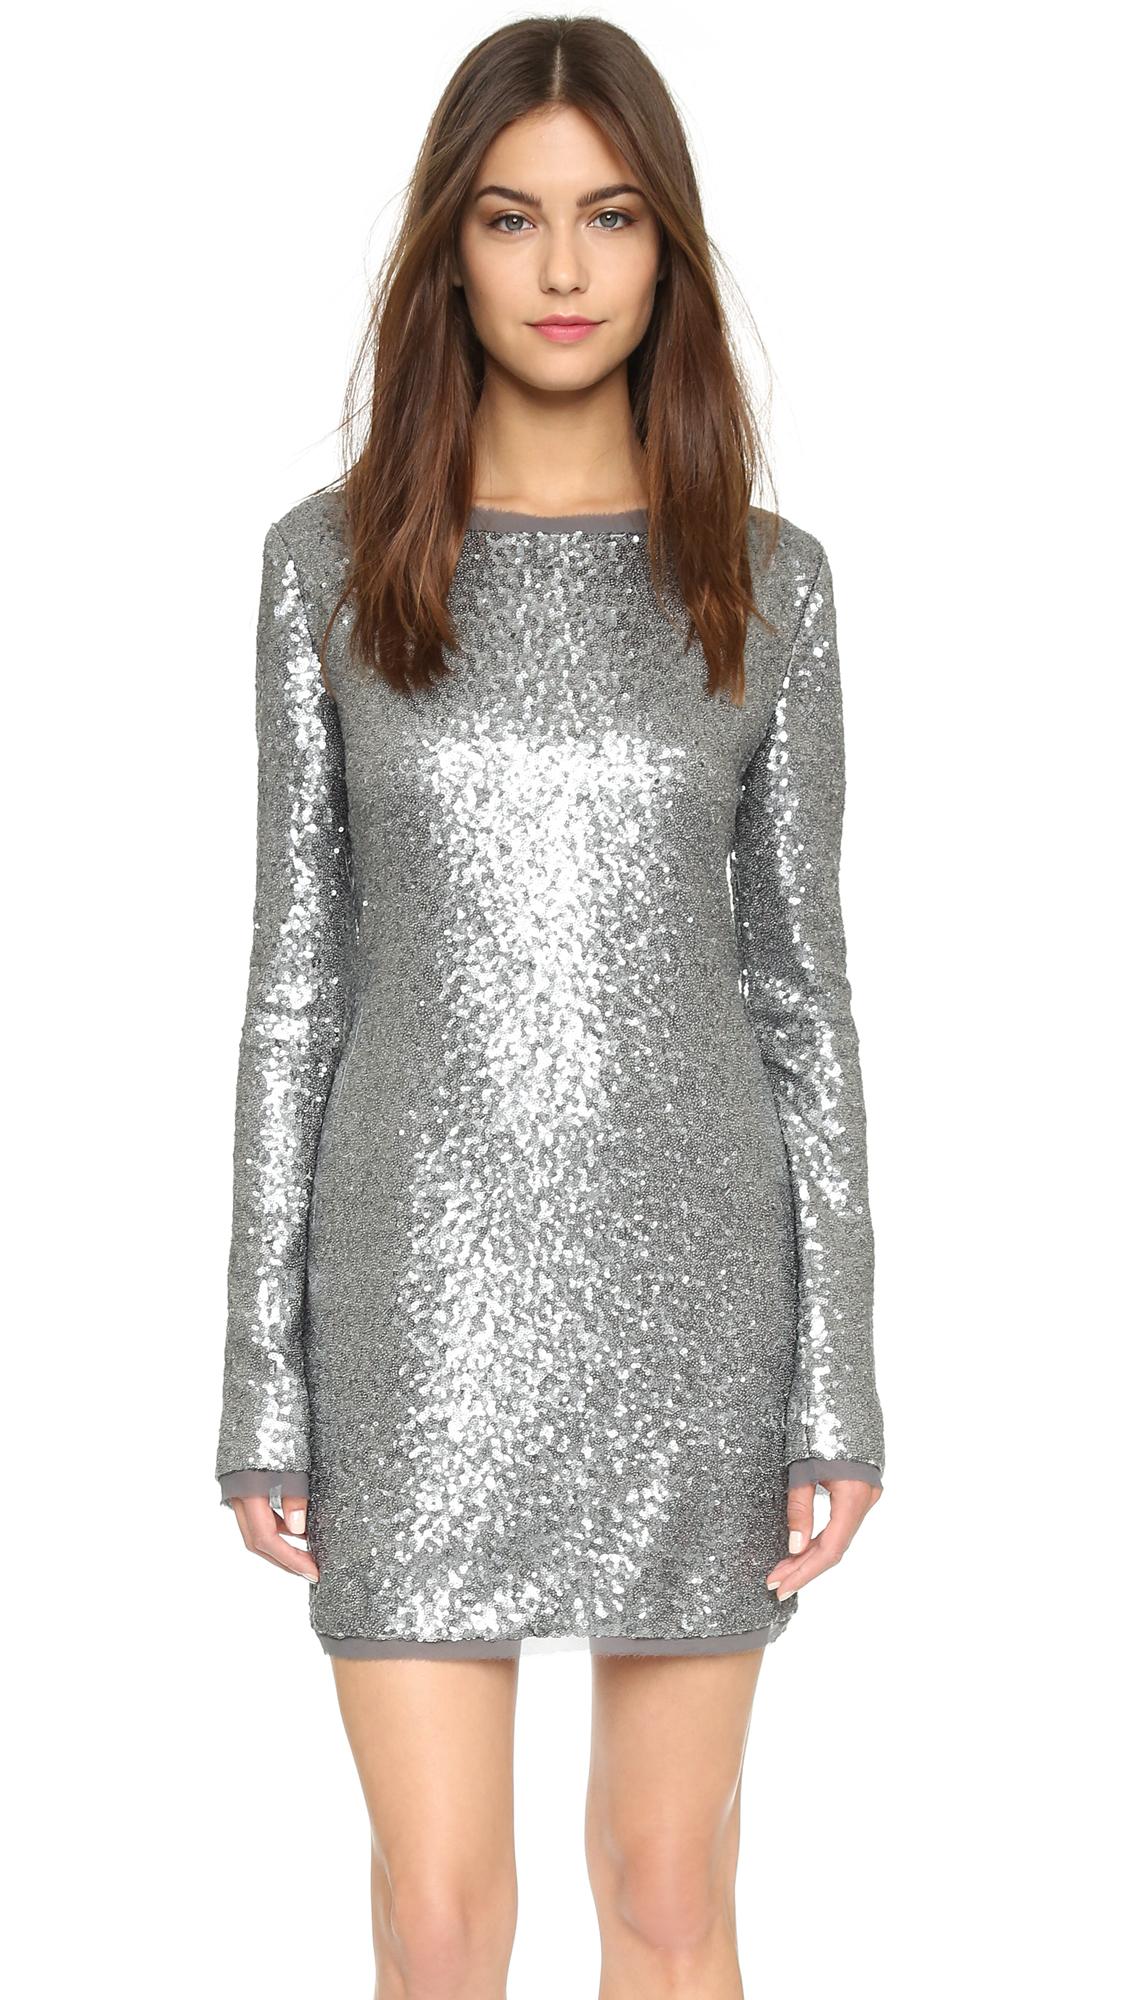 e090bb6bd5dc Rachel Zoe Sequin Mini Dress   SHOPBOP